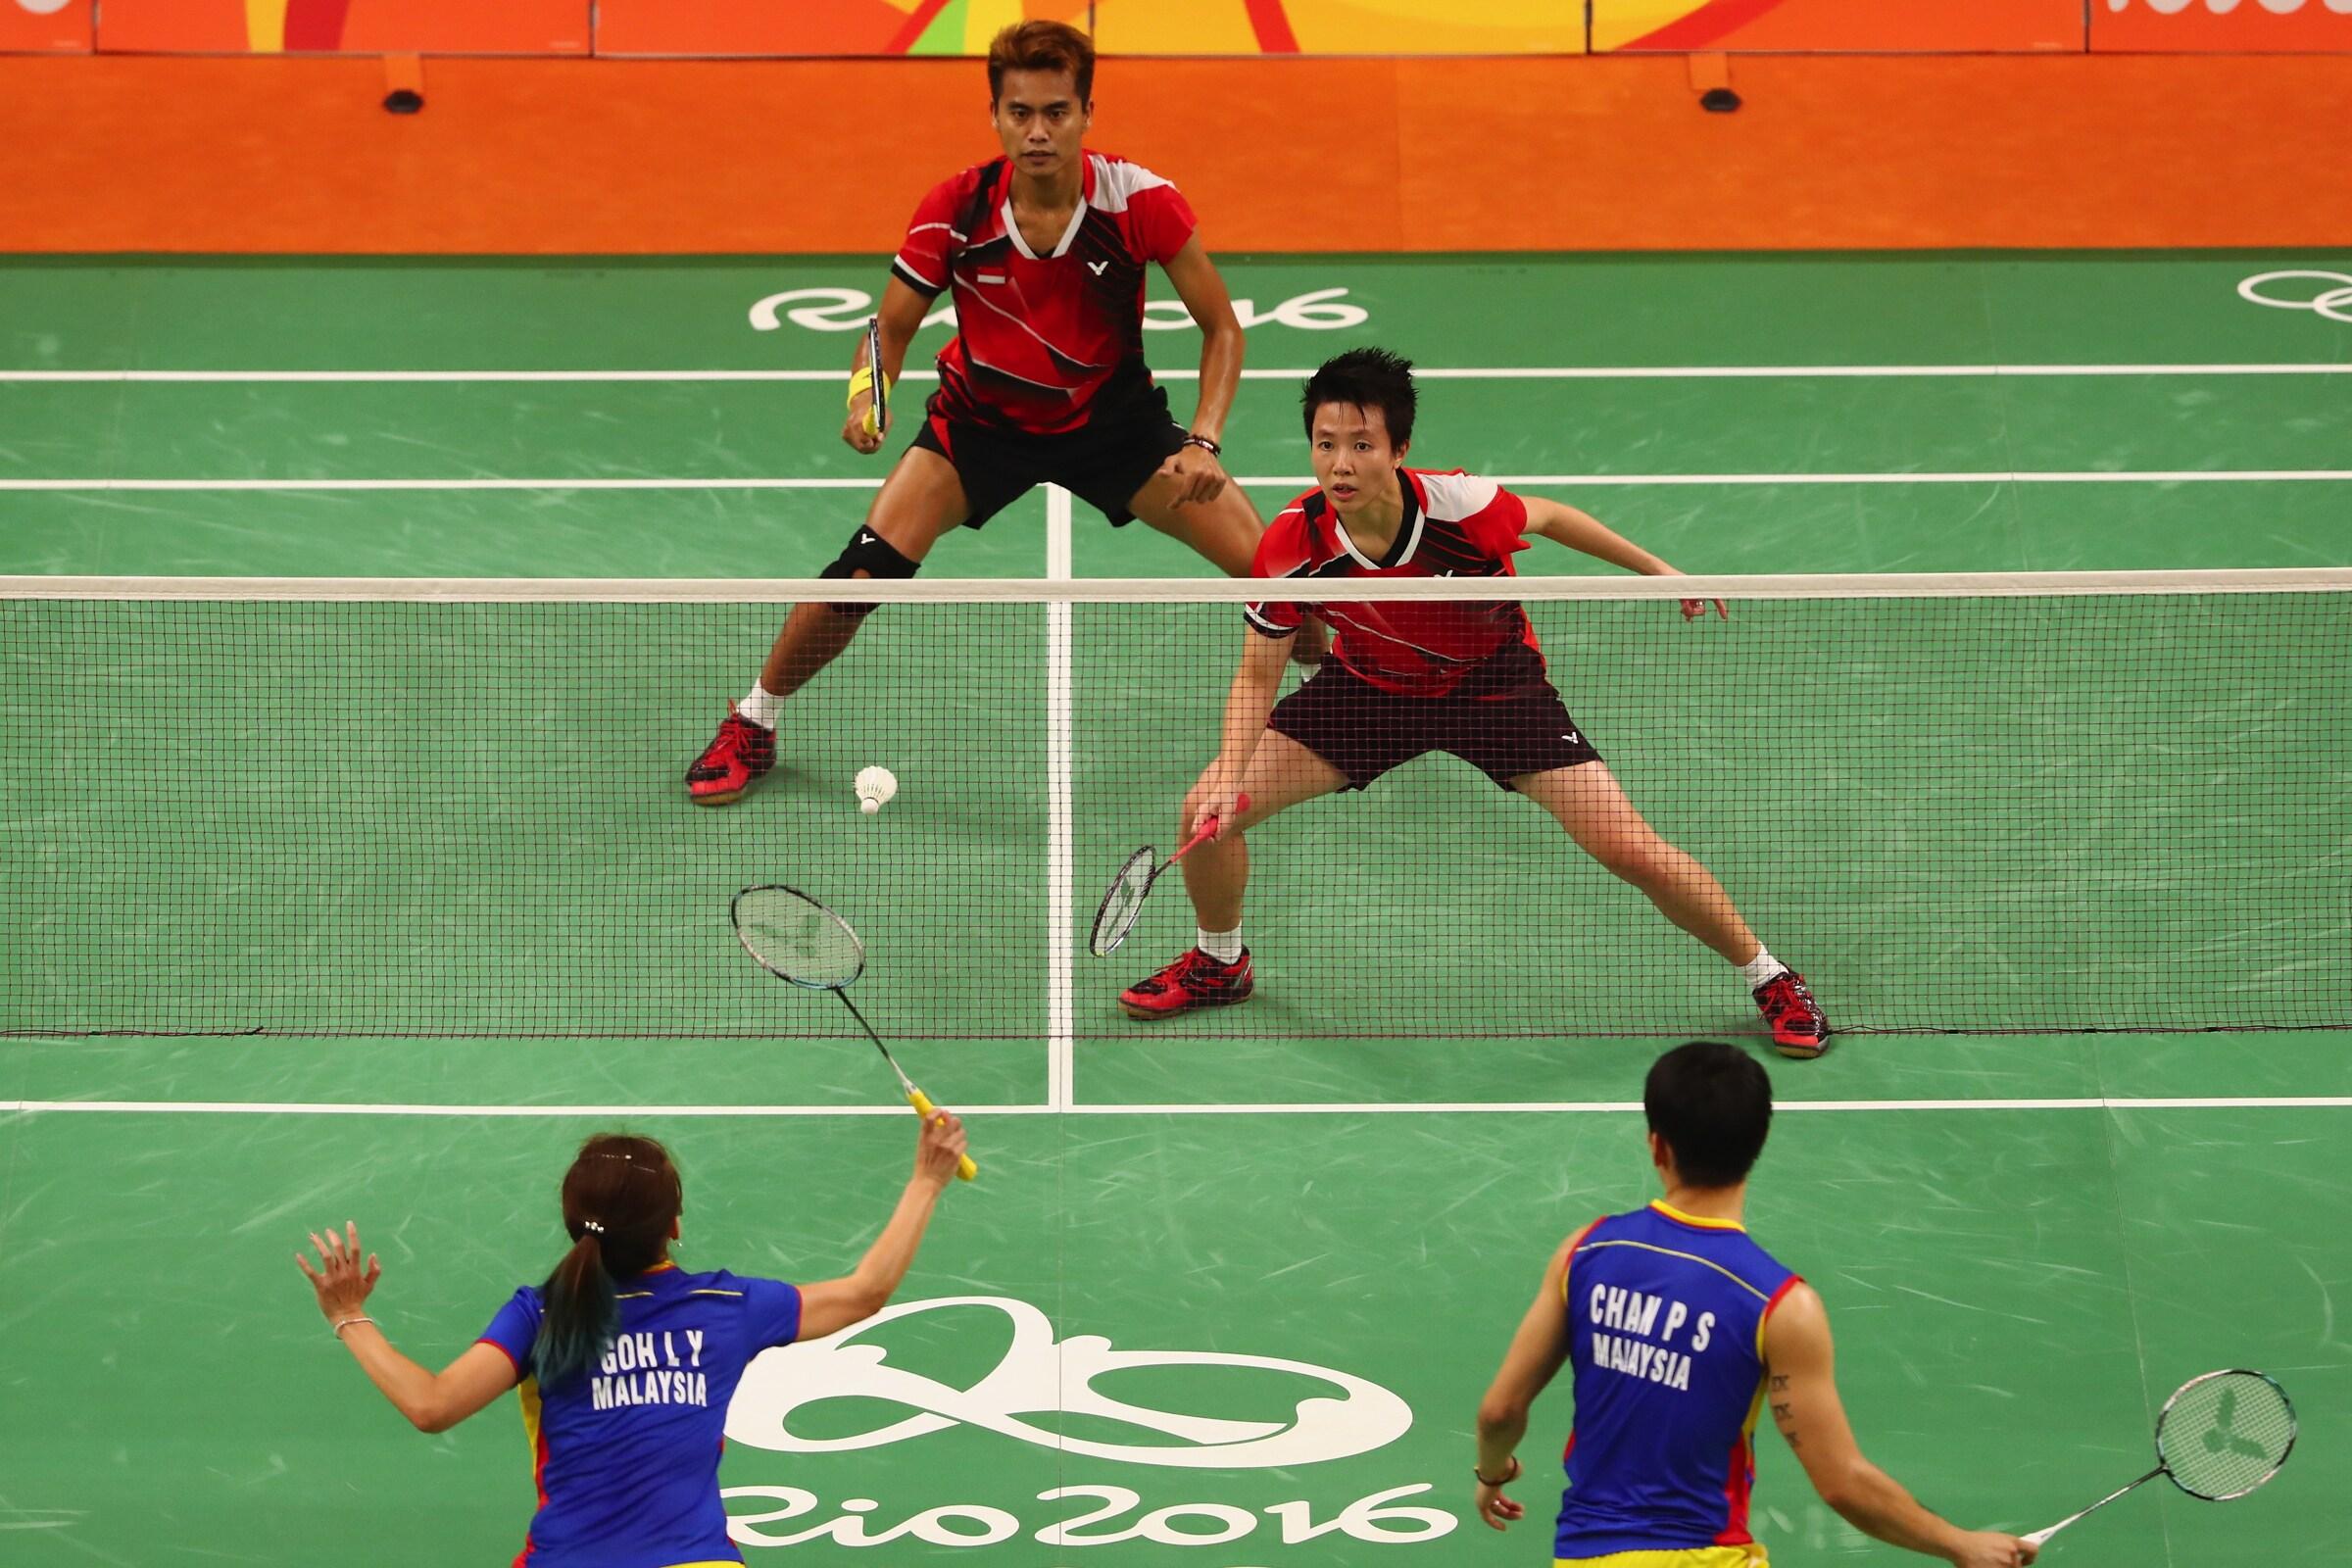 Badminton - Mixed Doubles